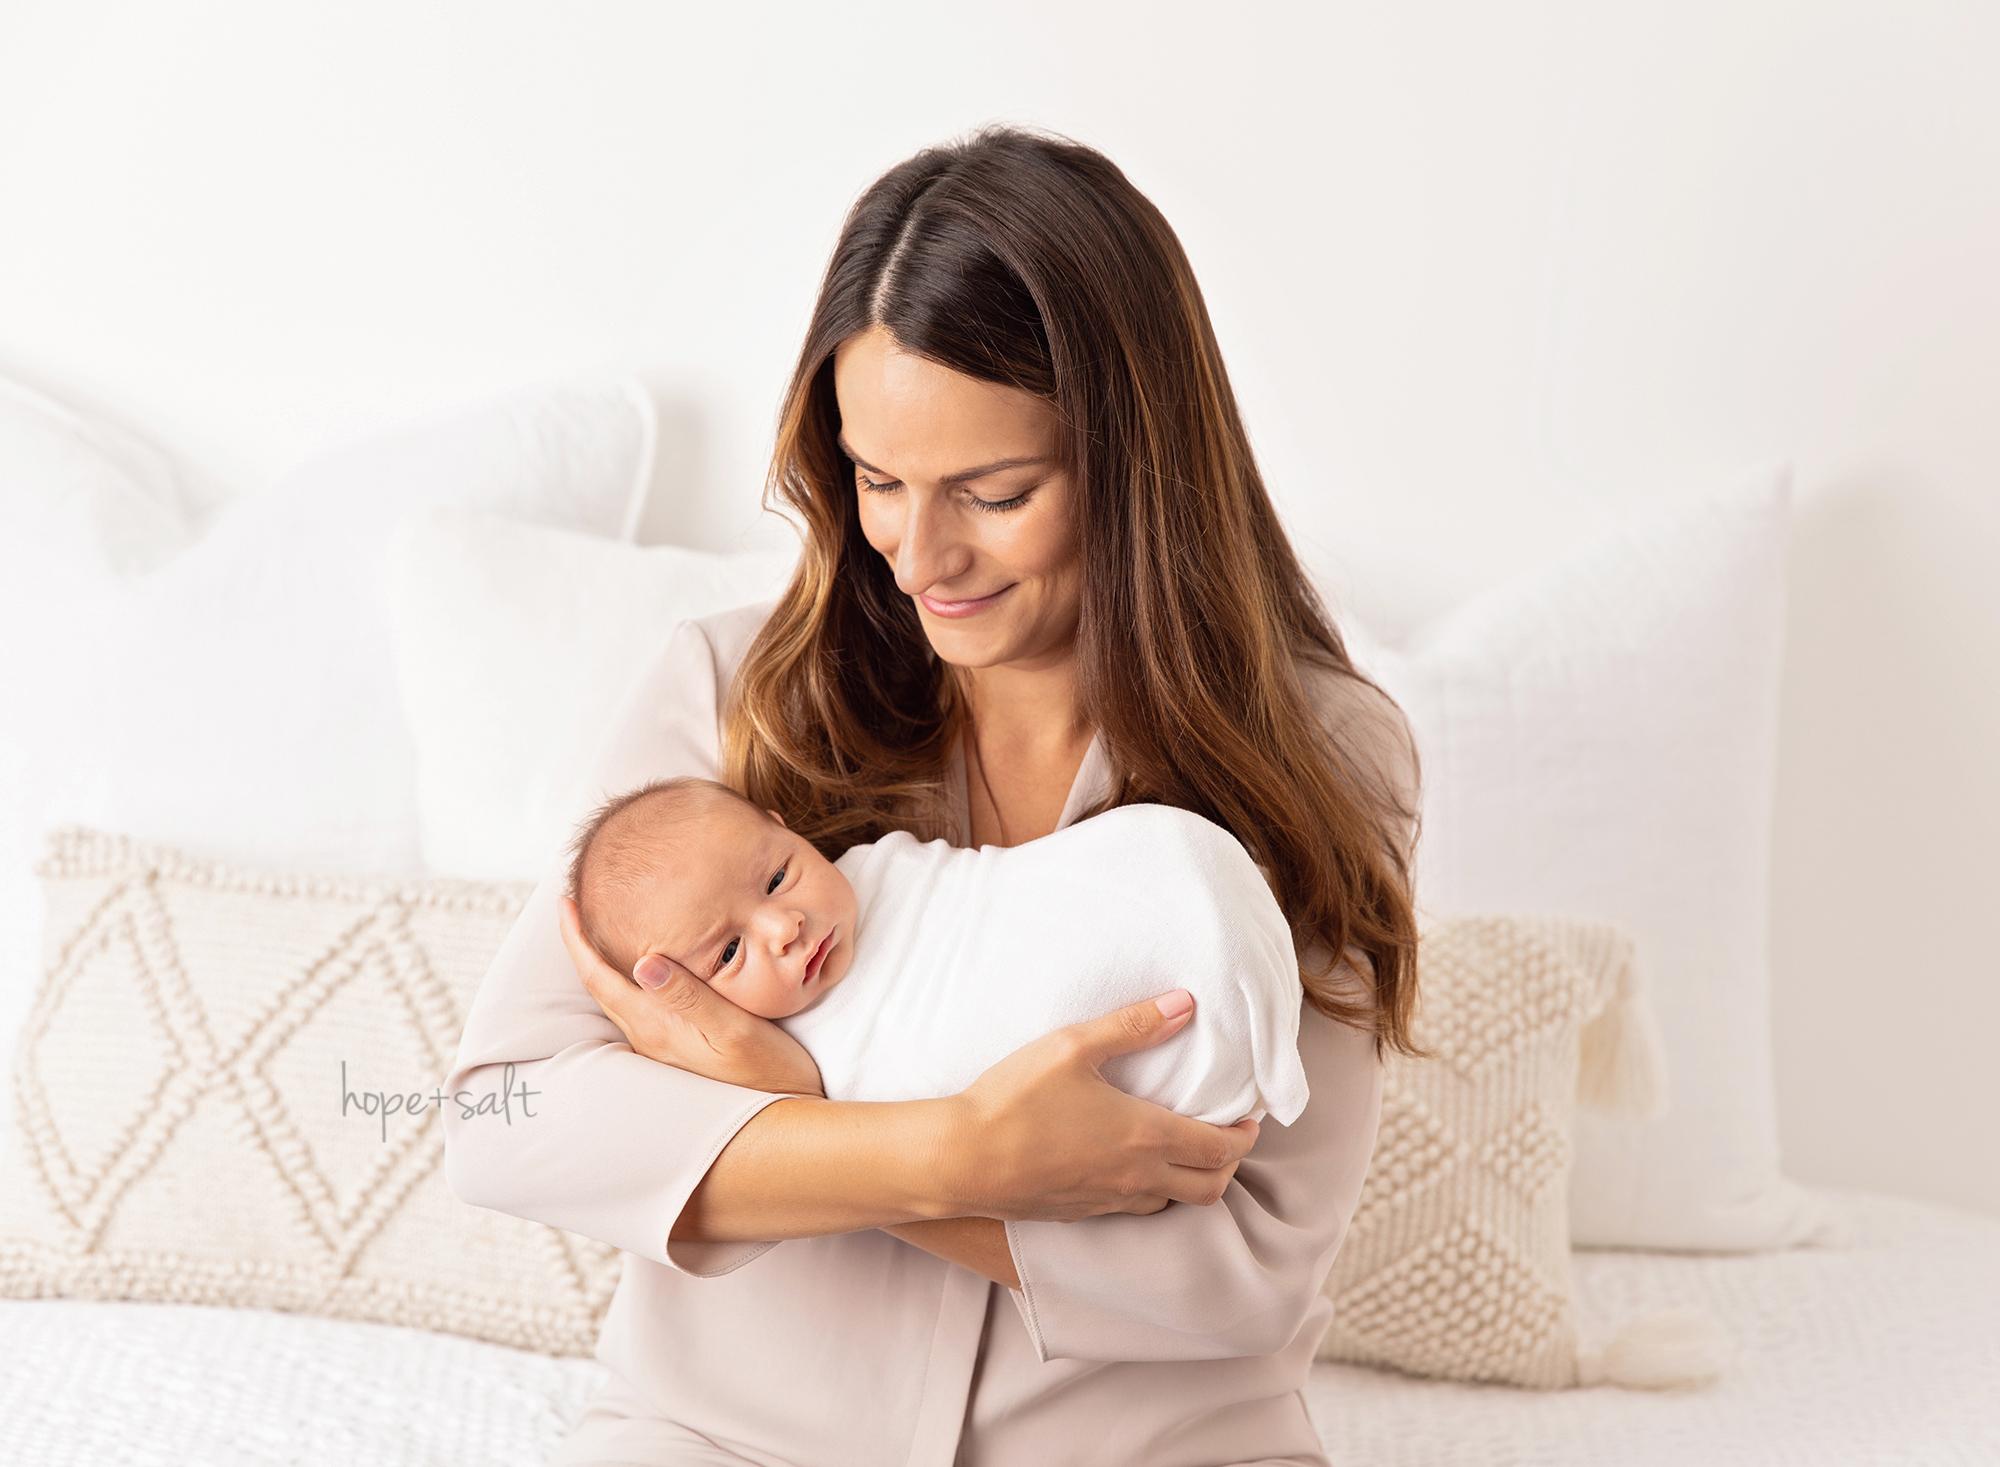 natural looking studio newborn photos for baby boy N 2020 hamilton ontario baby photographer hope and salt